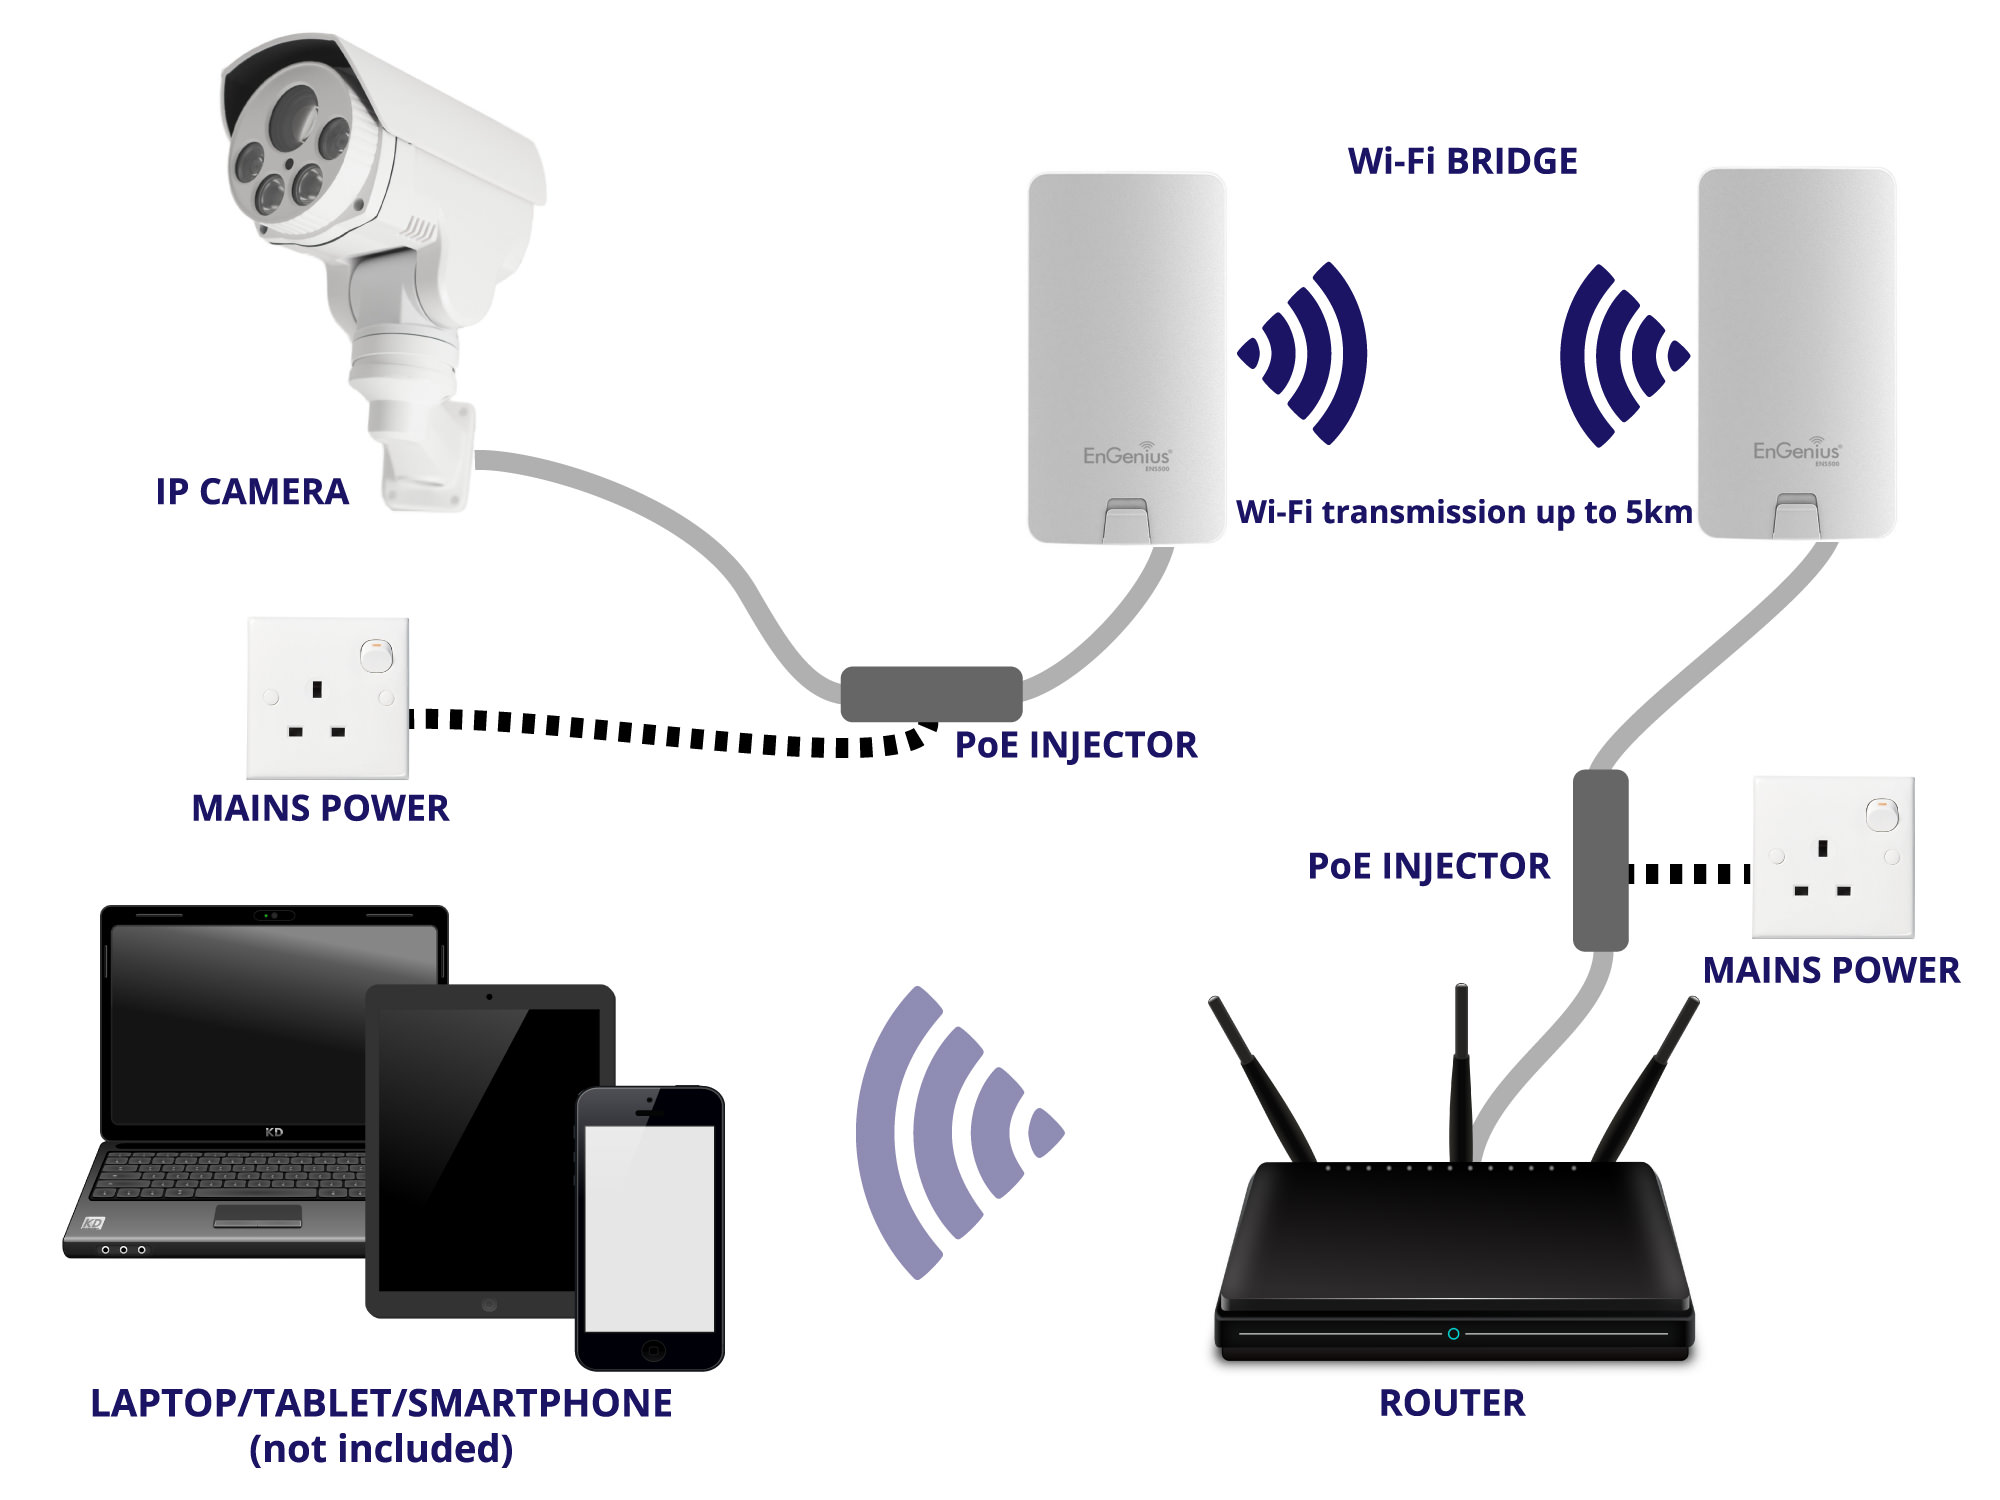 IP camera, PoE injector, WiFi bridge, PoE injector, router